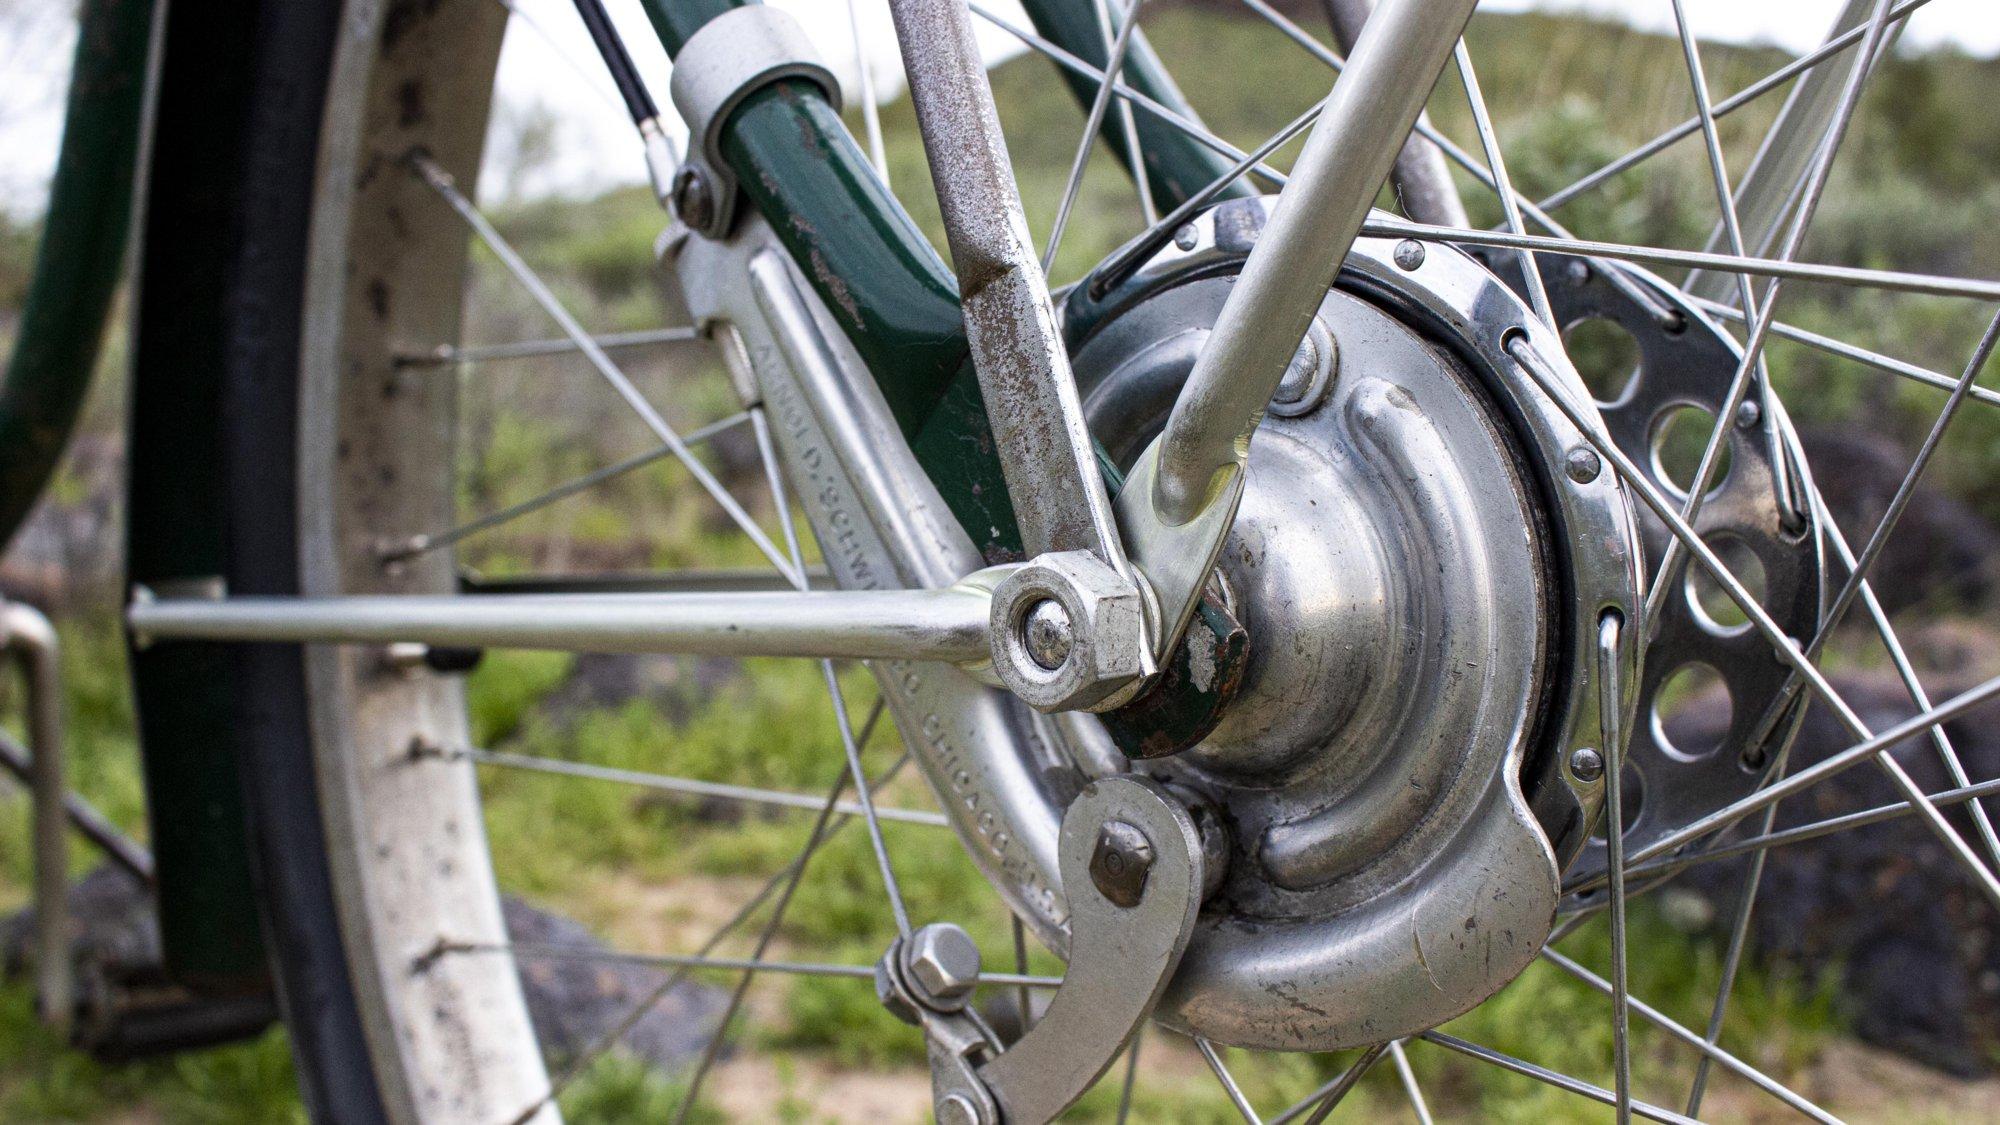 48_Autocycle_#7 copy.jpg